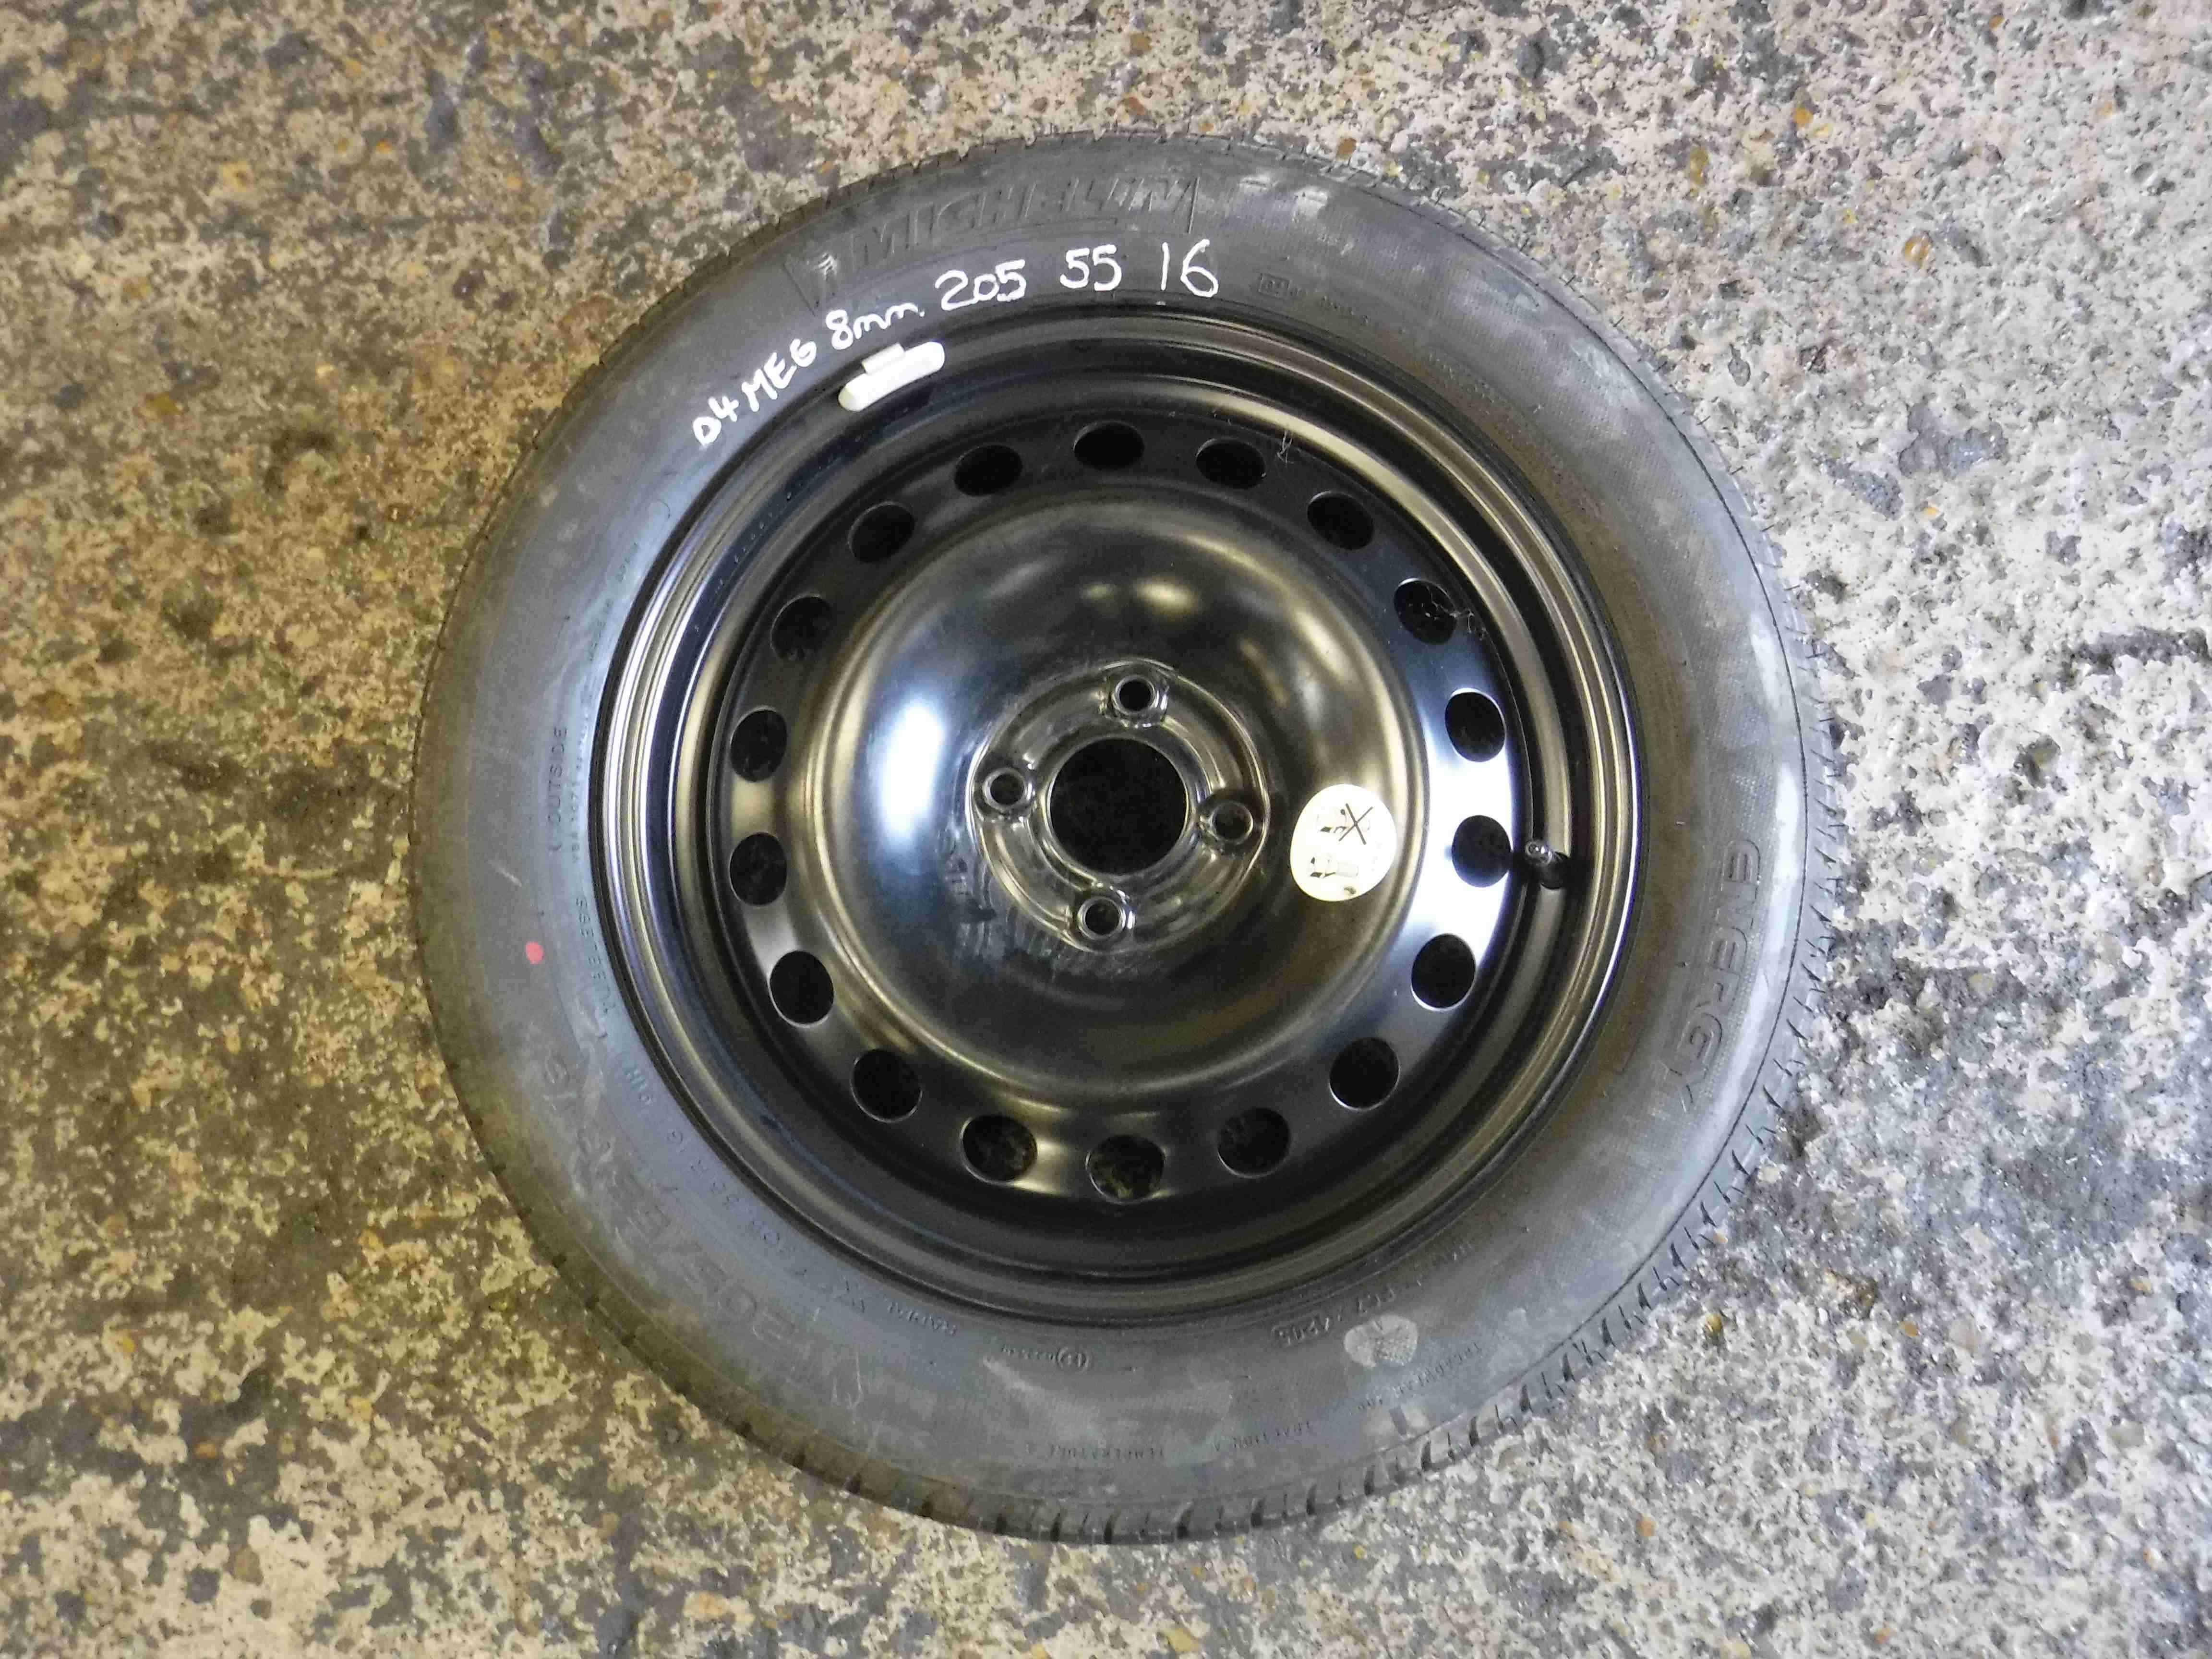 Renault Megane  Scenic 2003-2009 Spare Steel Wheel Rim  Tyre 205 55 16 8mm 55